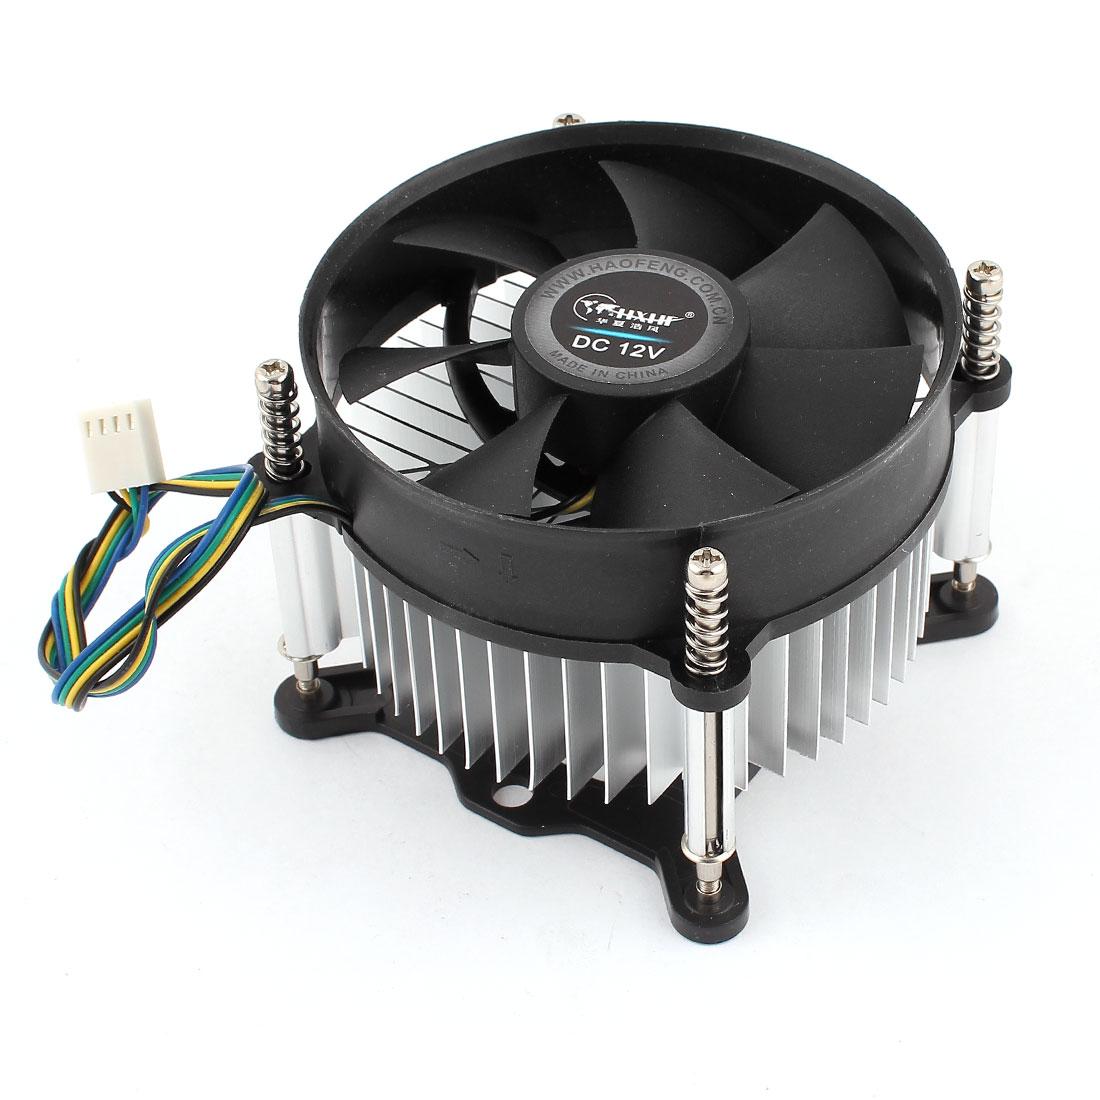 DC 12V 2200RPM 4Pins PC CPU Cooler Cooling Fan Heatsink for for Intel Socket 95W